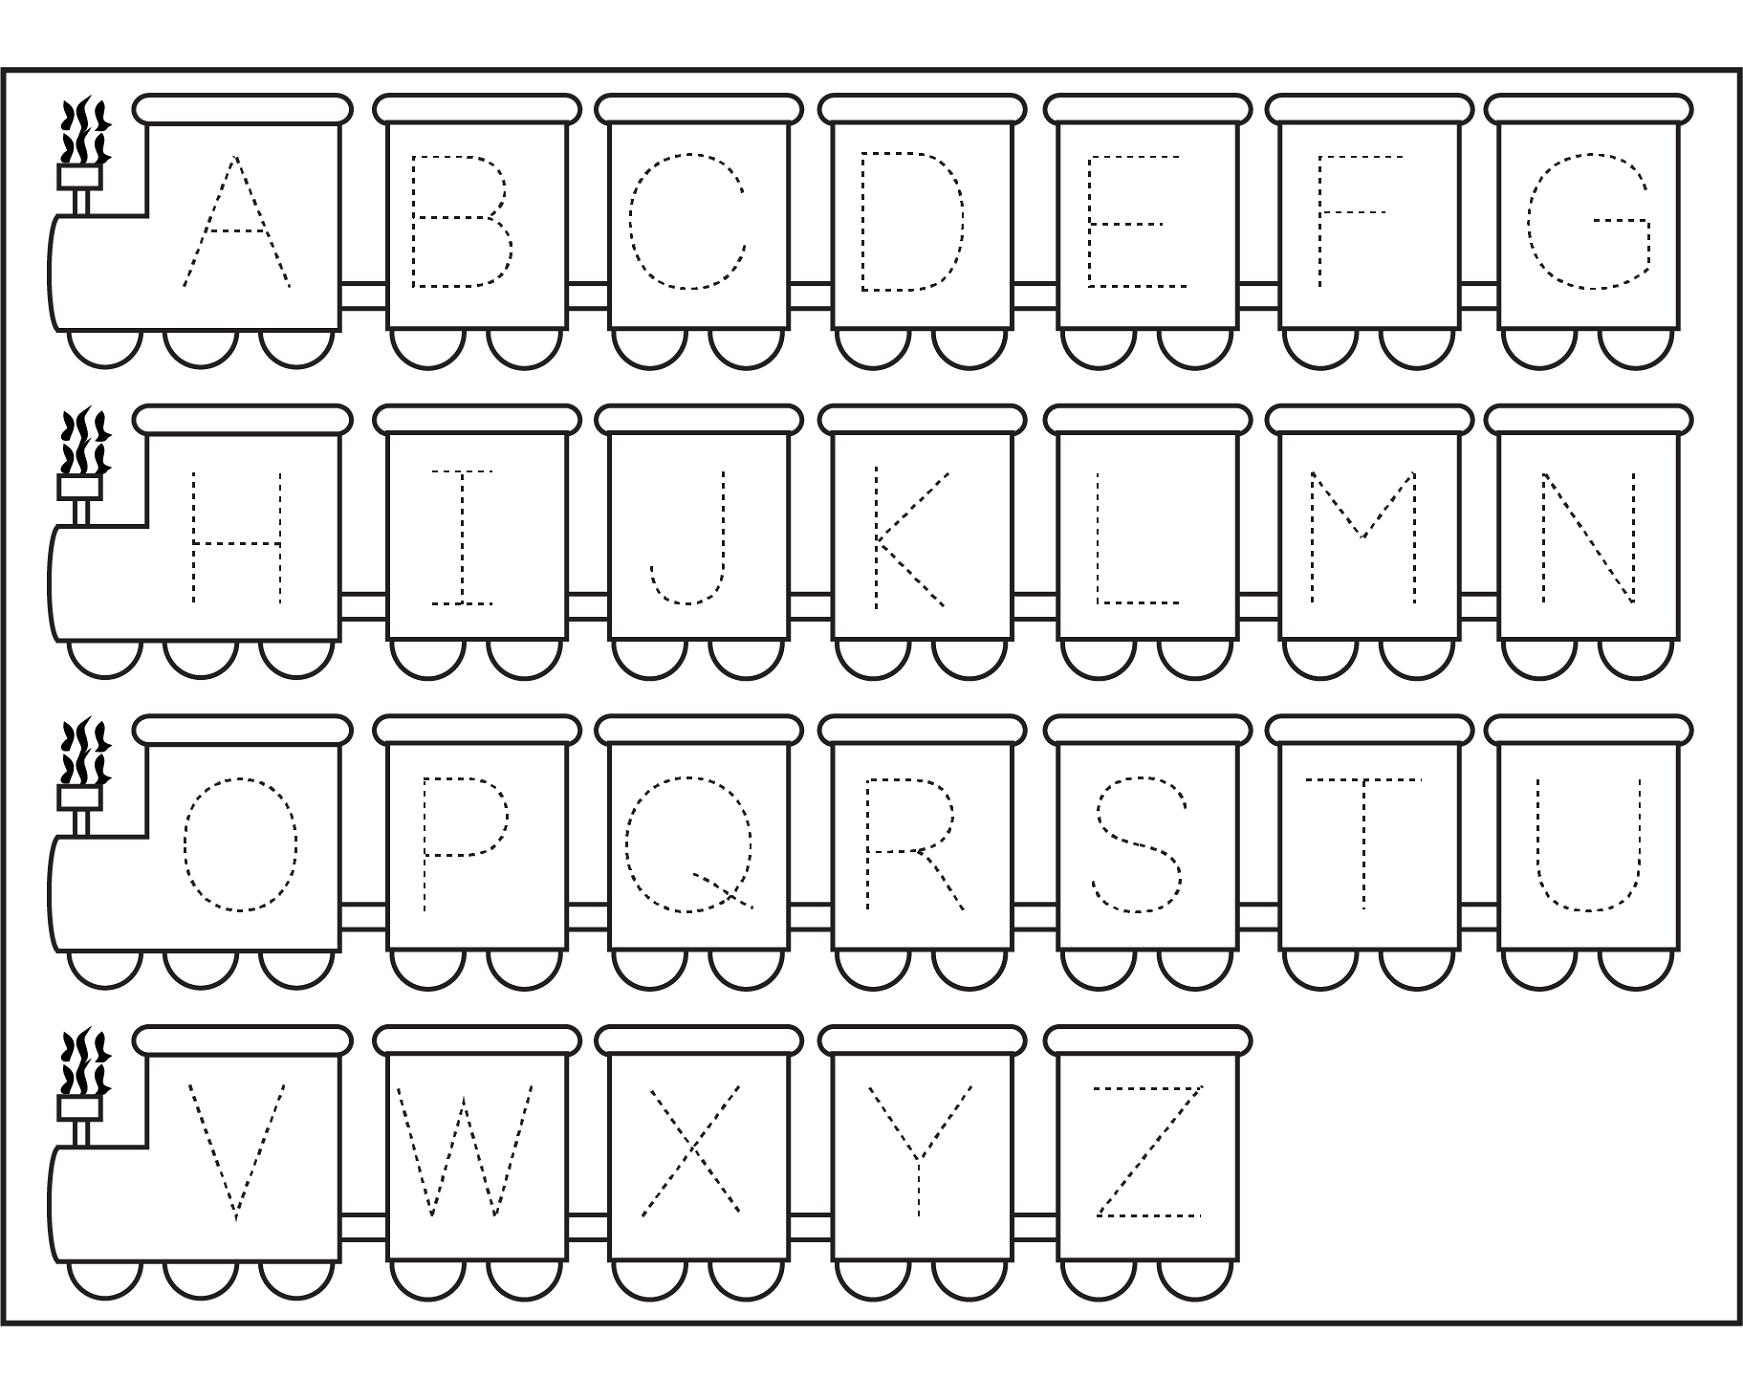 traceable letters worksheets train